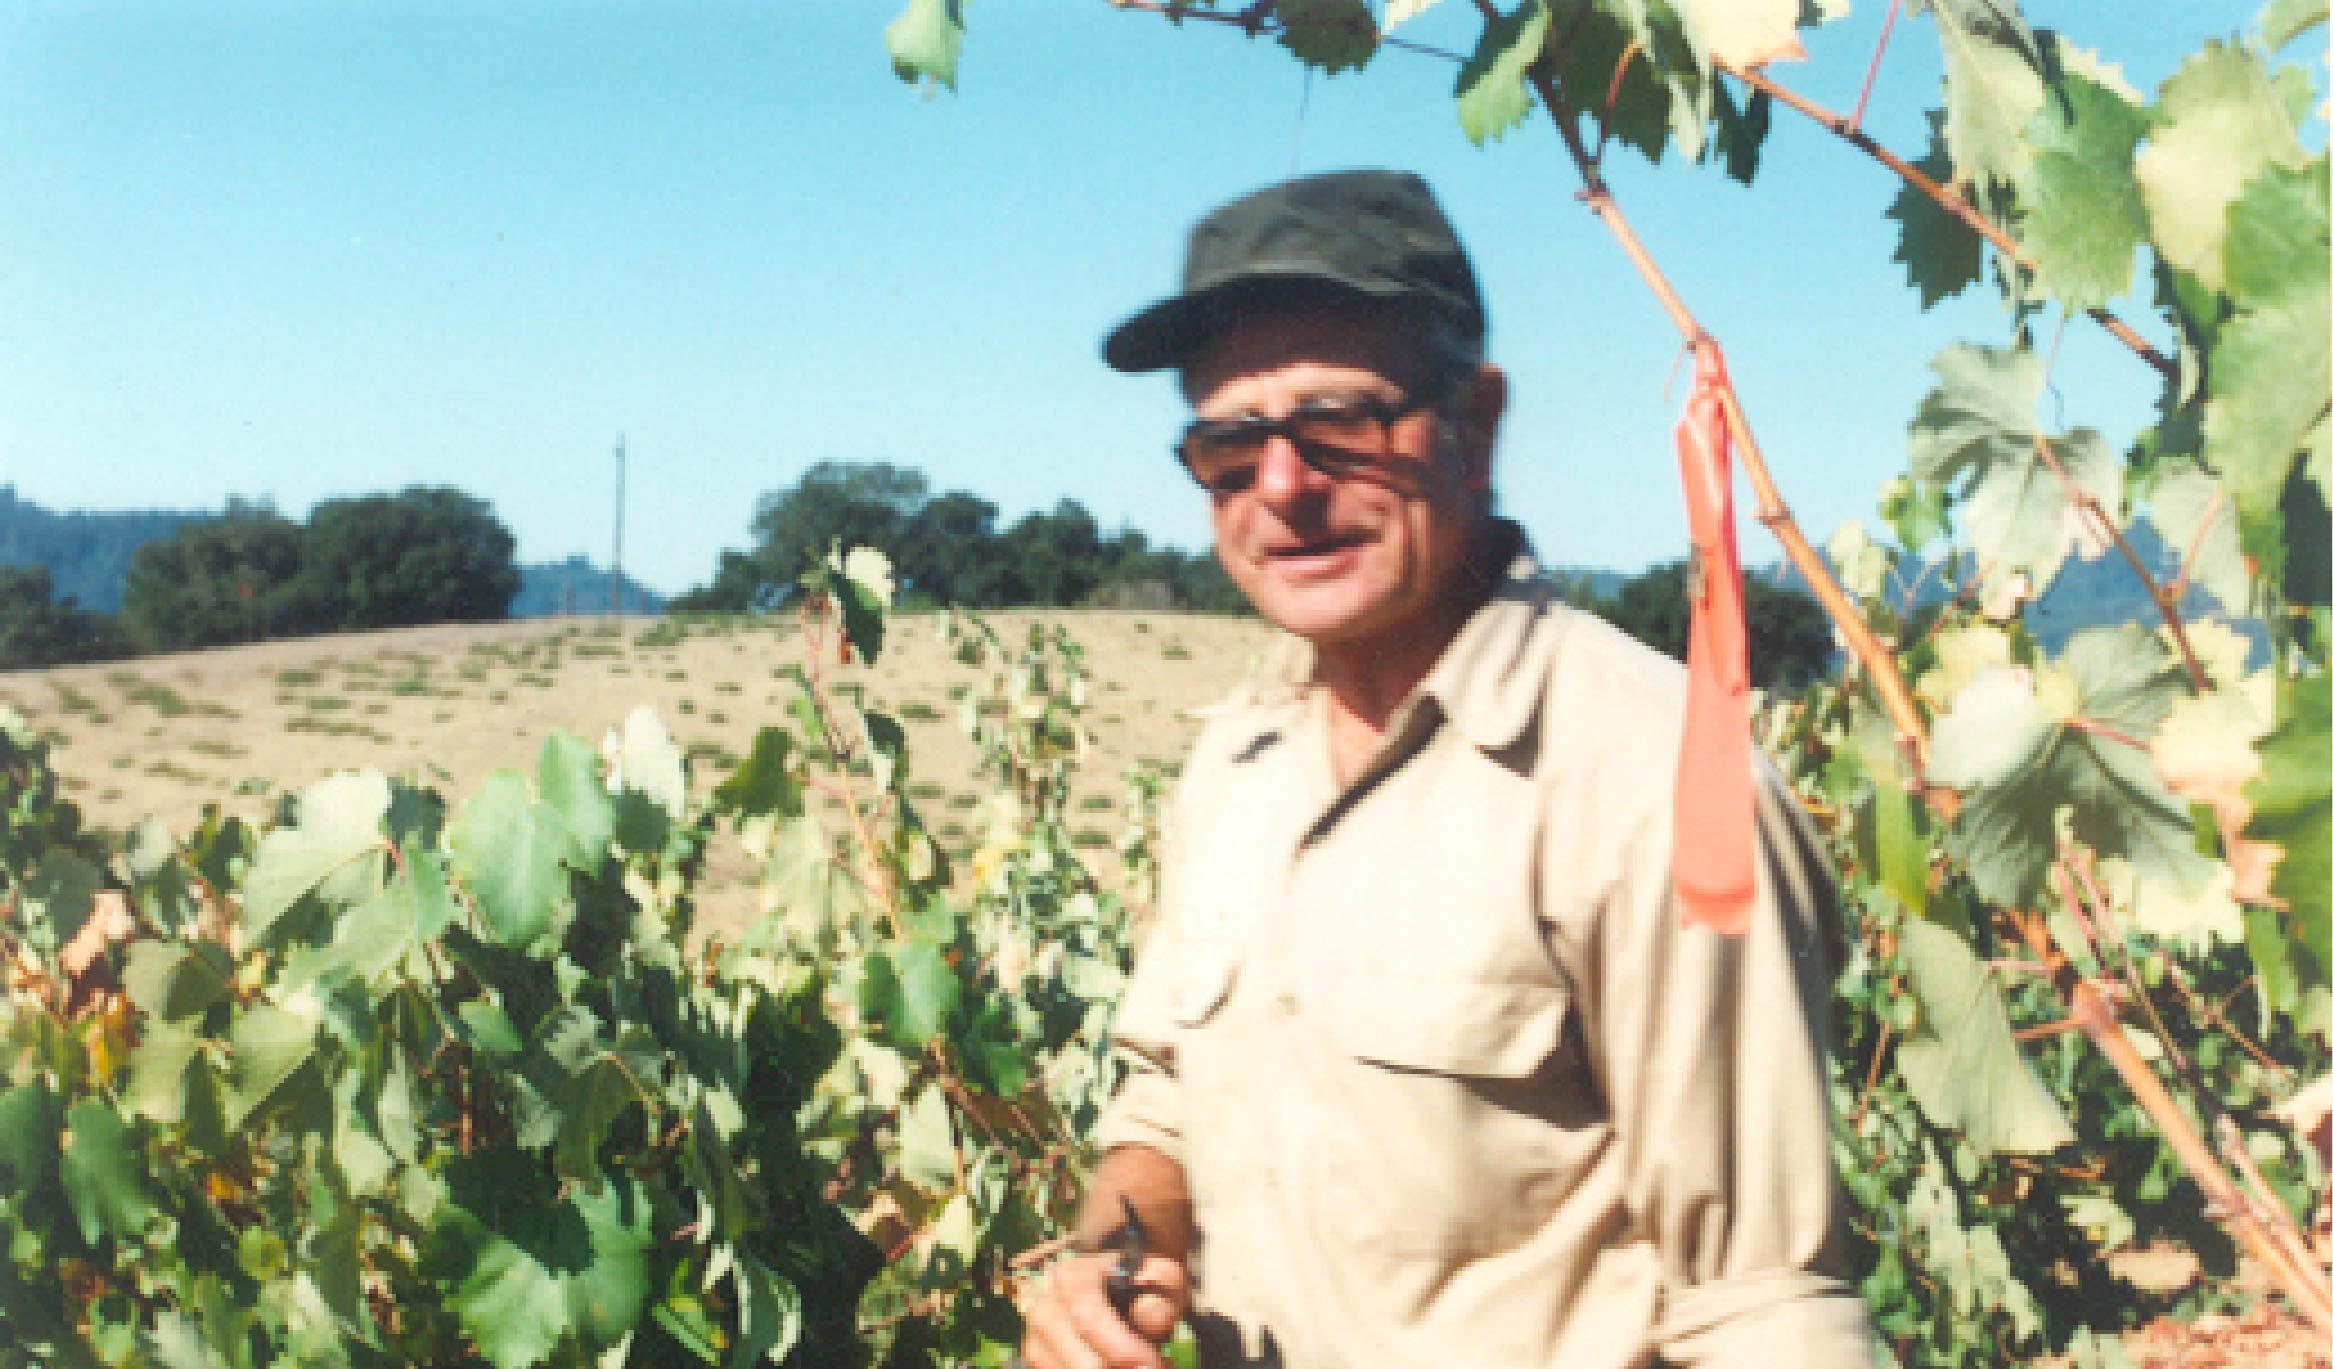 Chester Brandlin checking on the vineyard.